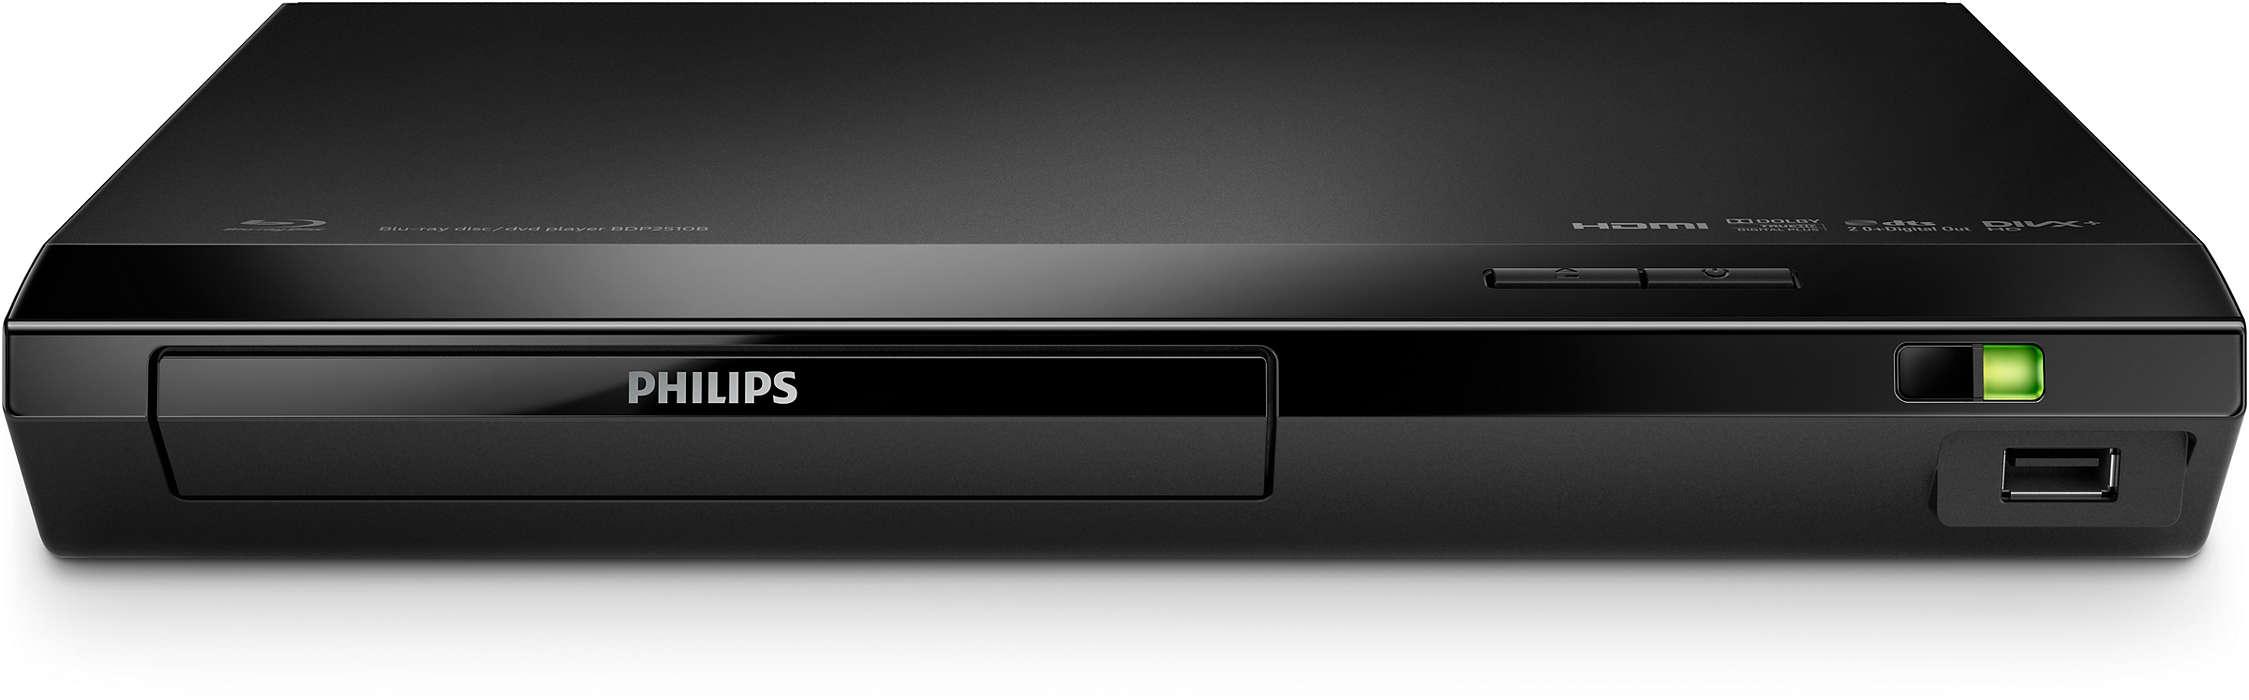 De snelste Philips Blu-ray Disc-speler ooit